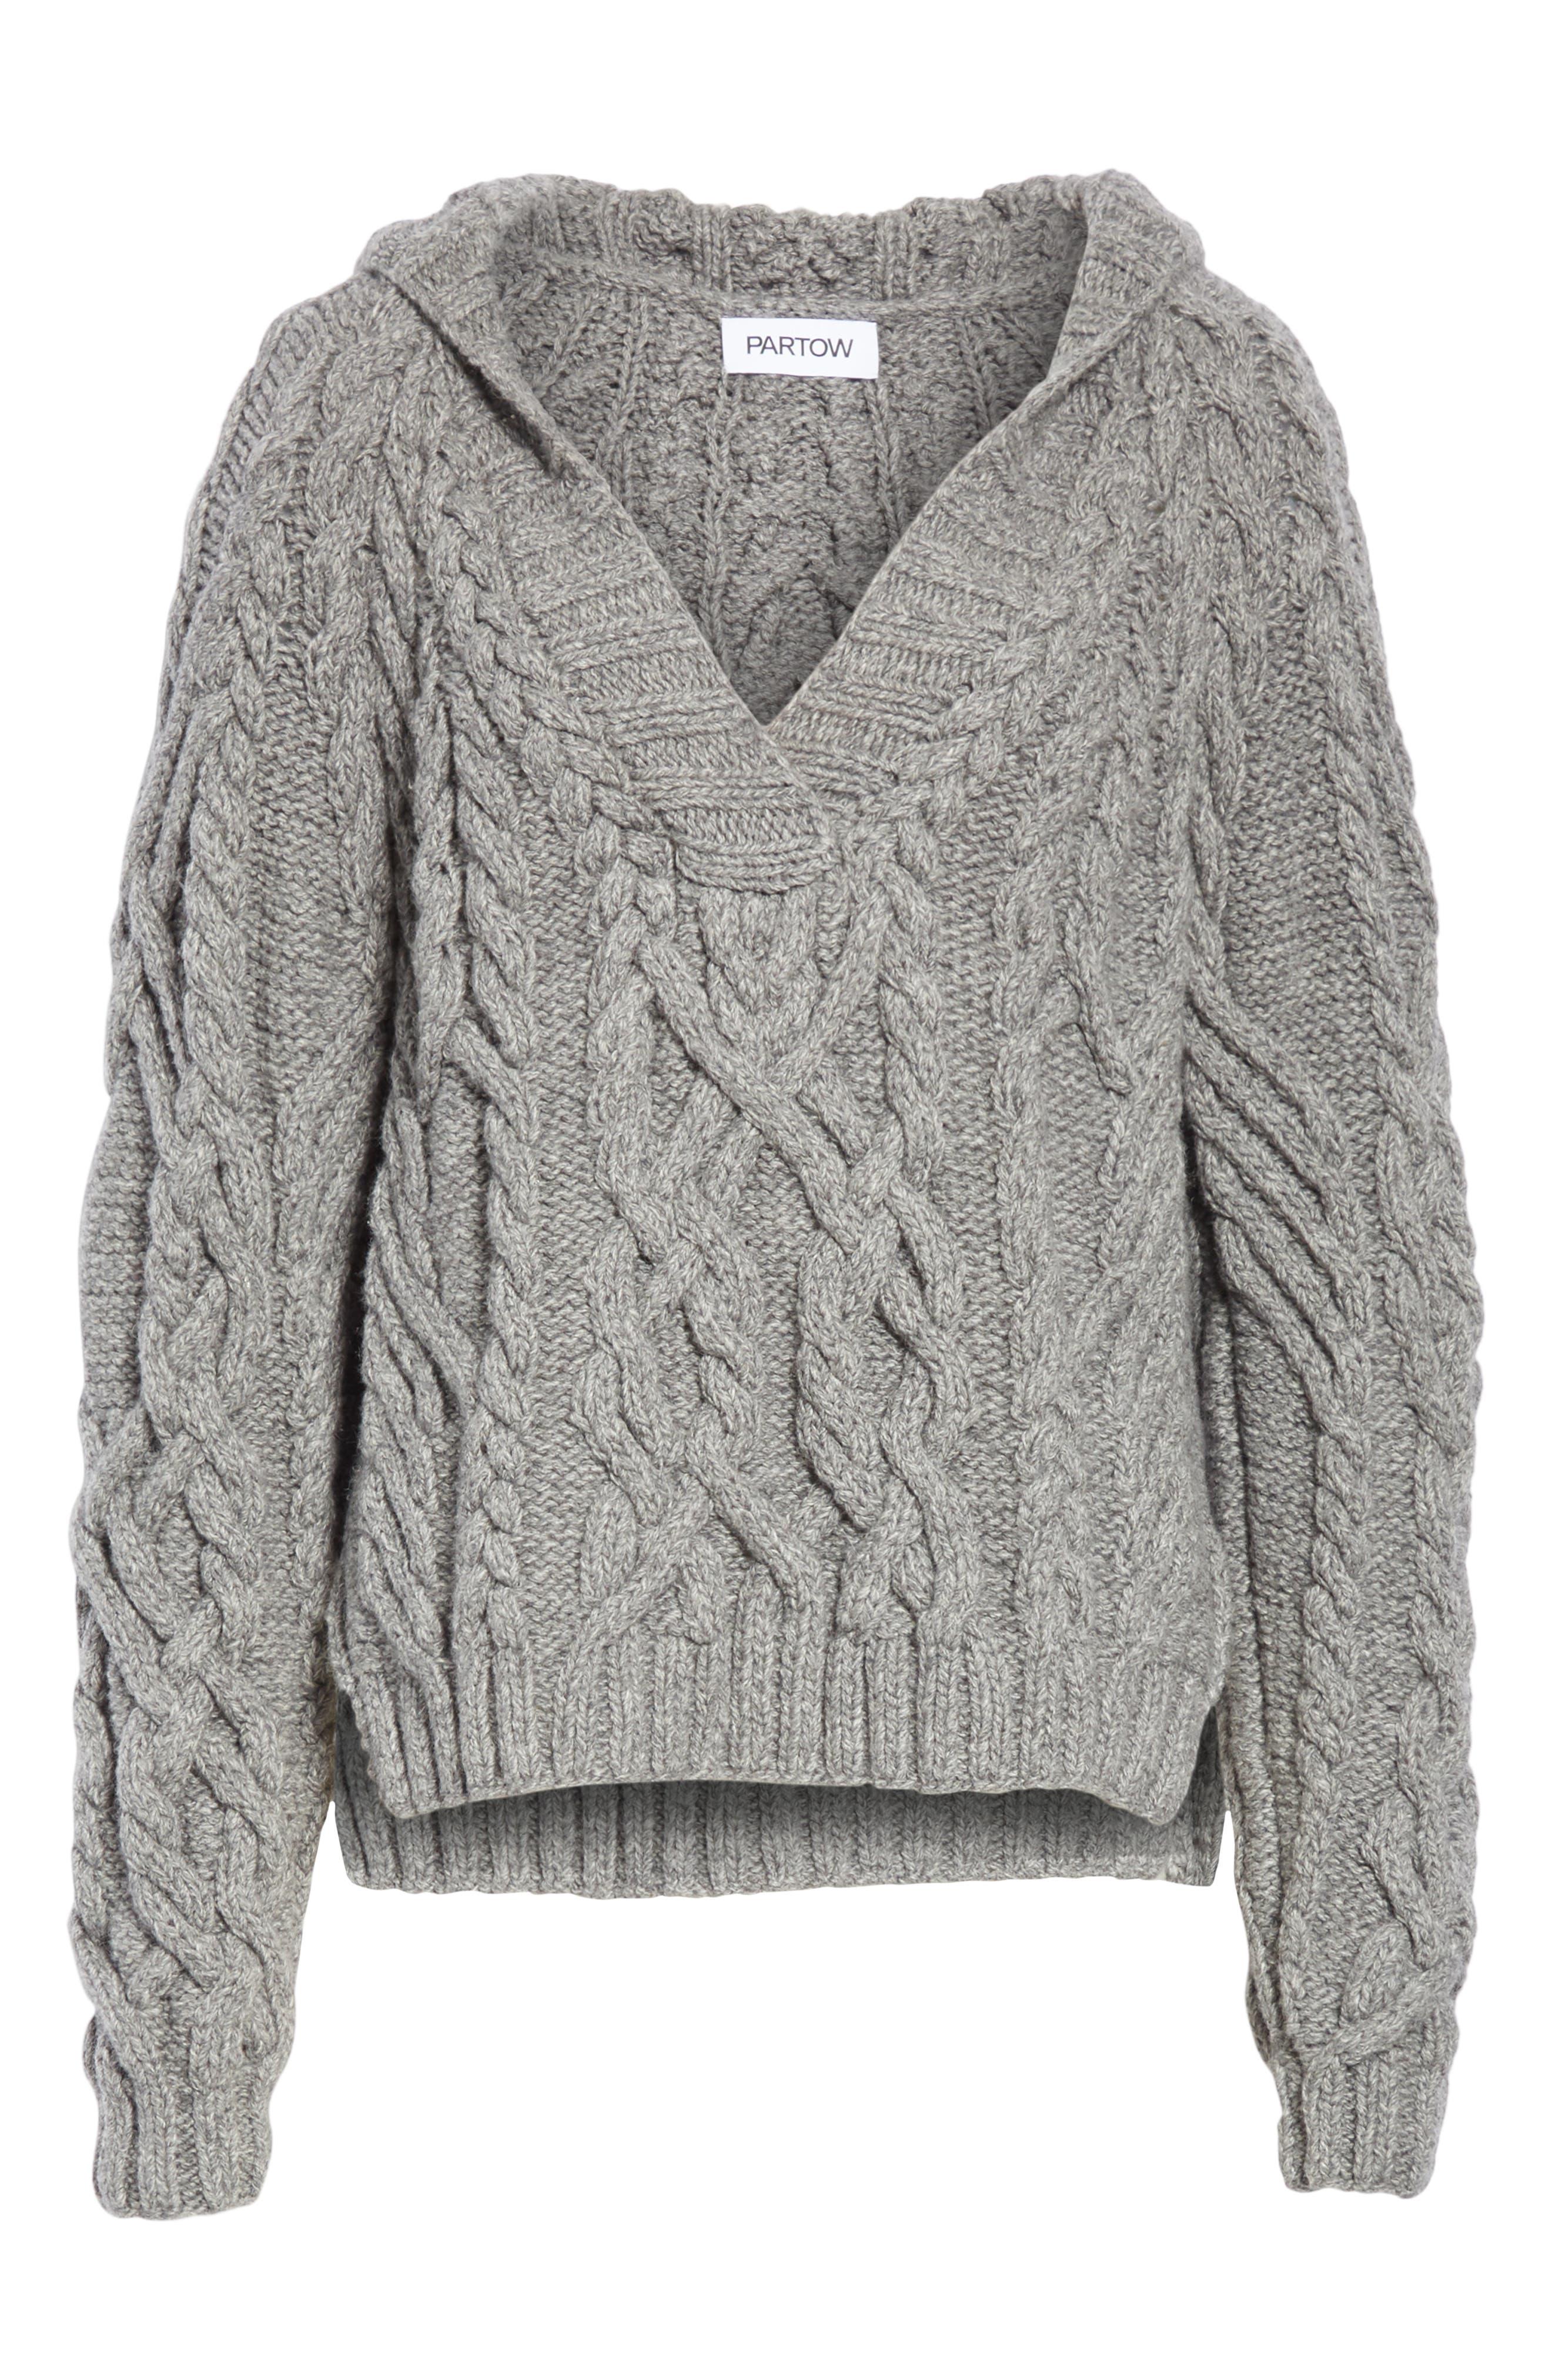 Mélange Cable Knit Hooded Sweater,                             Alternate thumbnail 6, color,                             GREY MELANGE